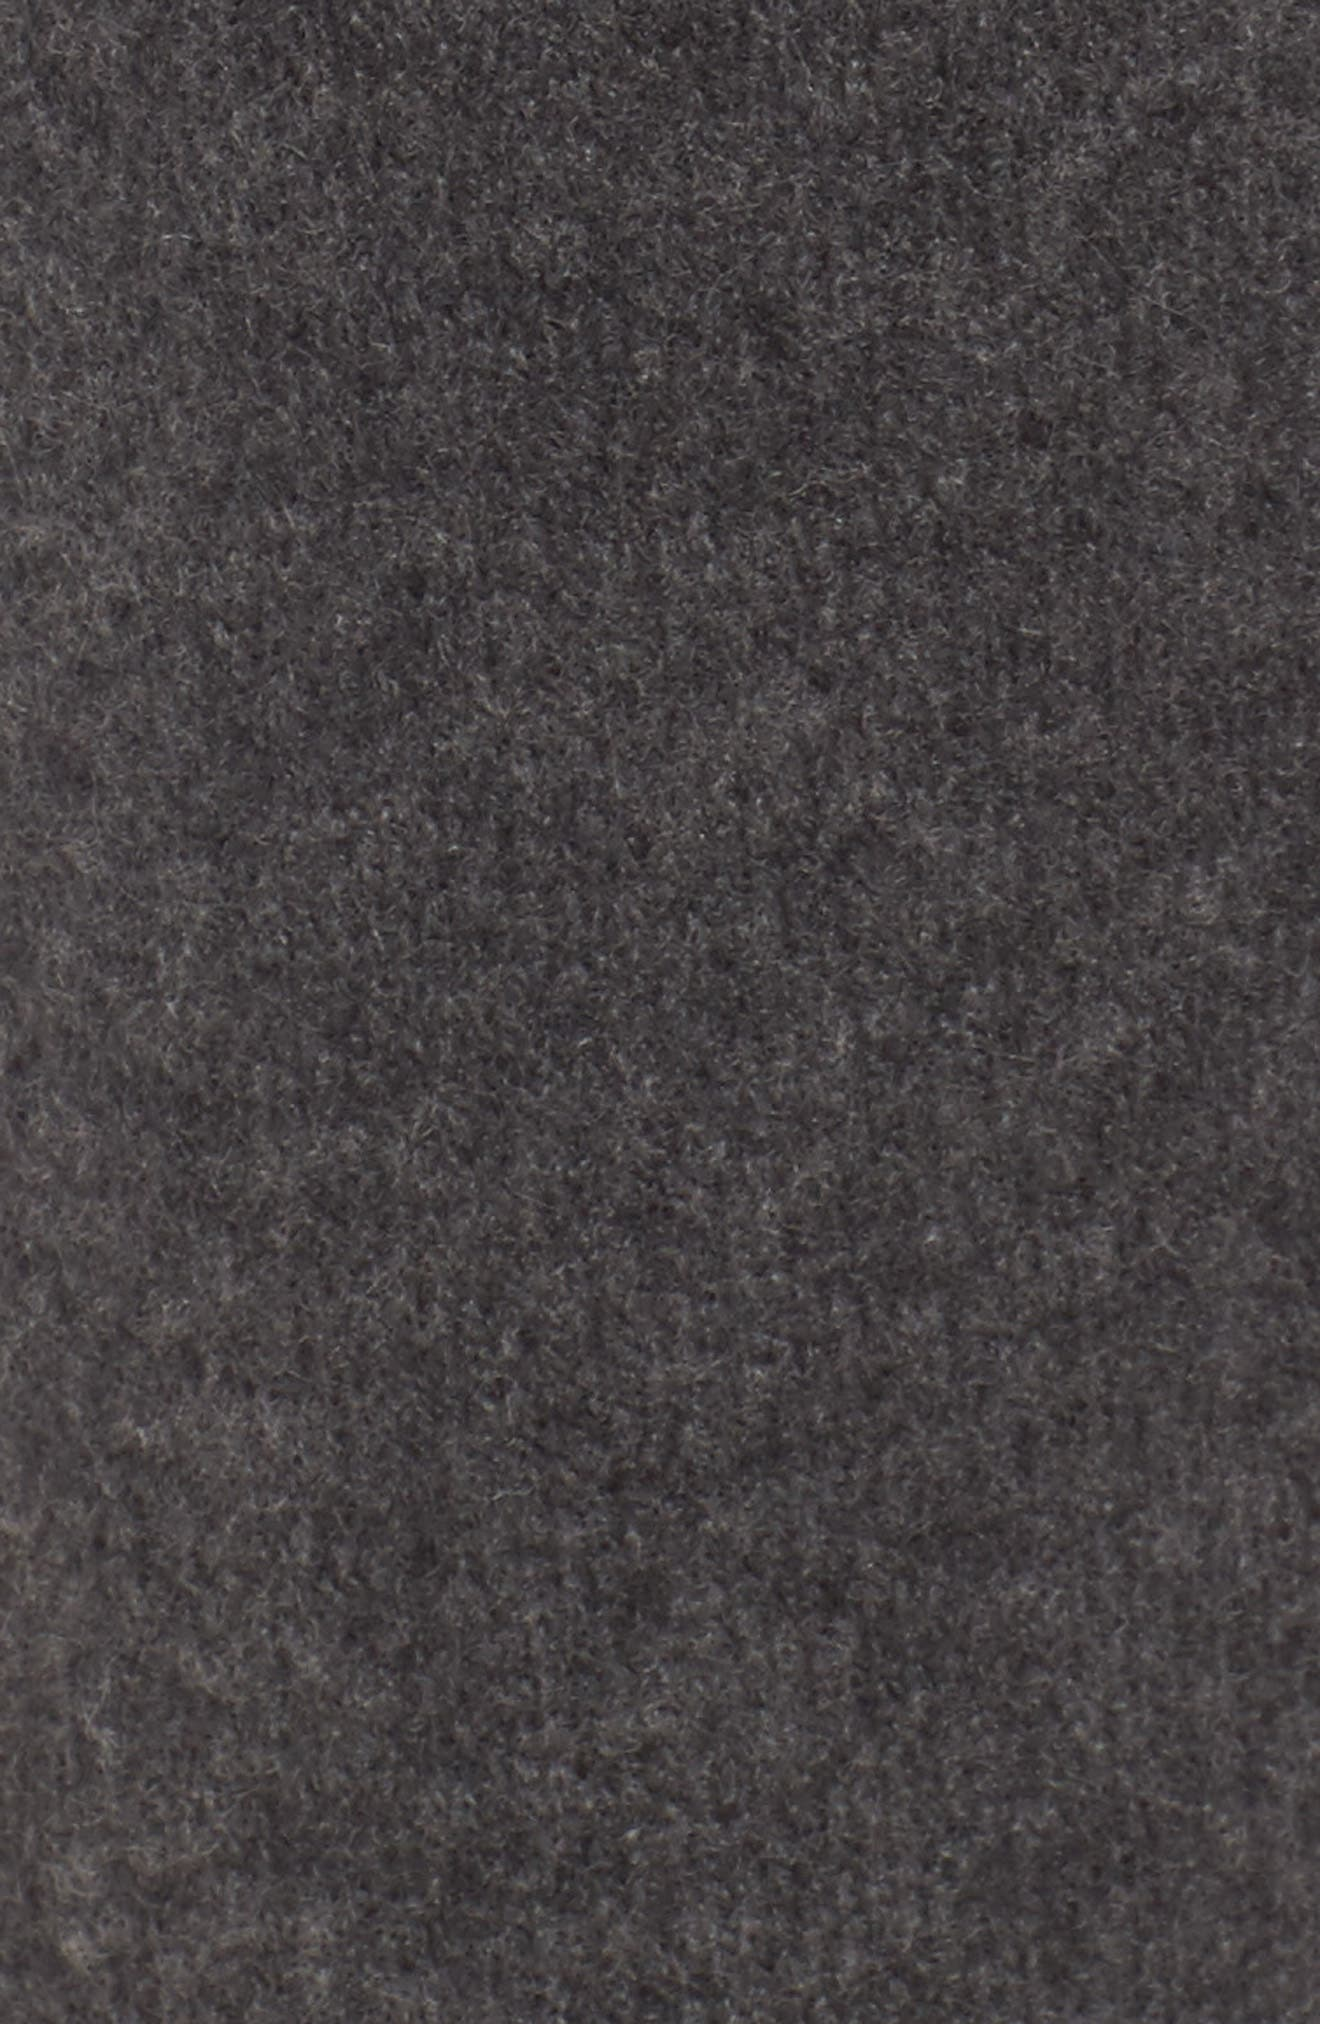 Brushed Cashmere Sweatpants,                             Alternate thumbnail 5, color,                             Charcoal